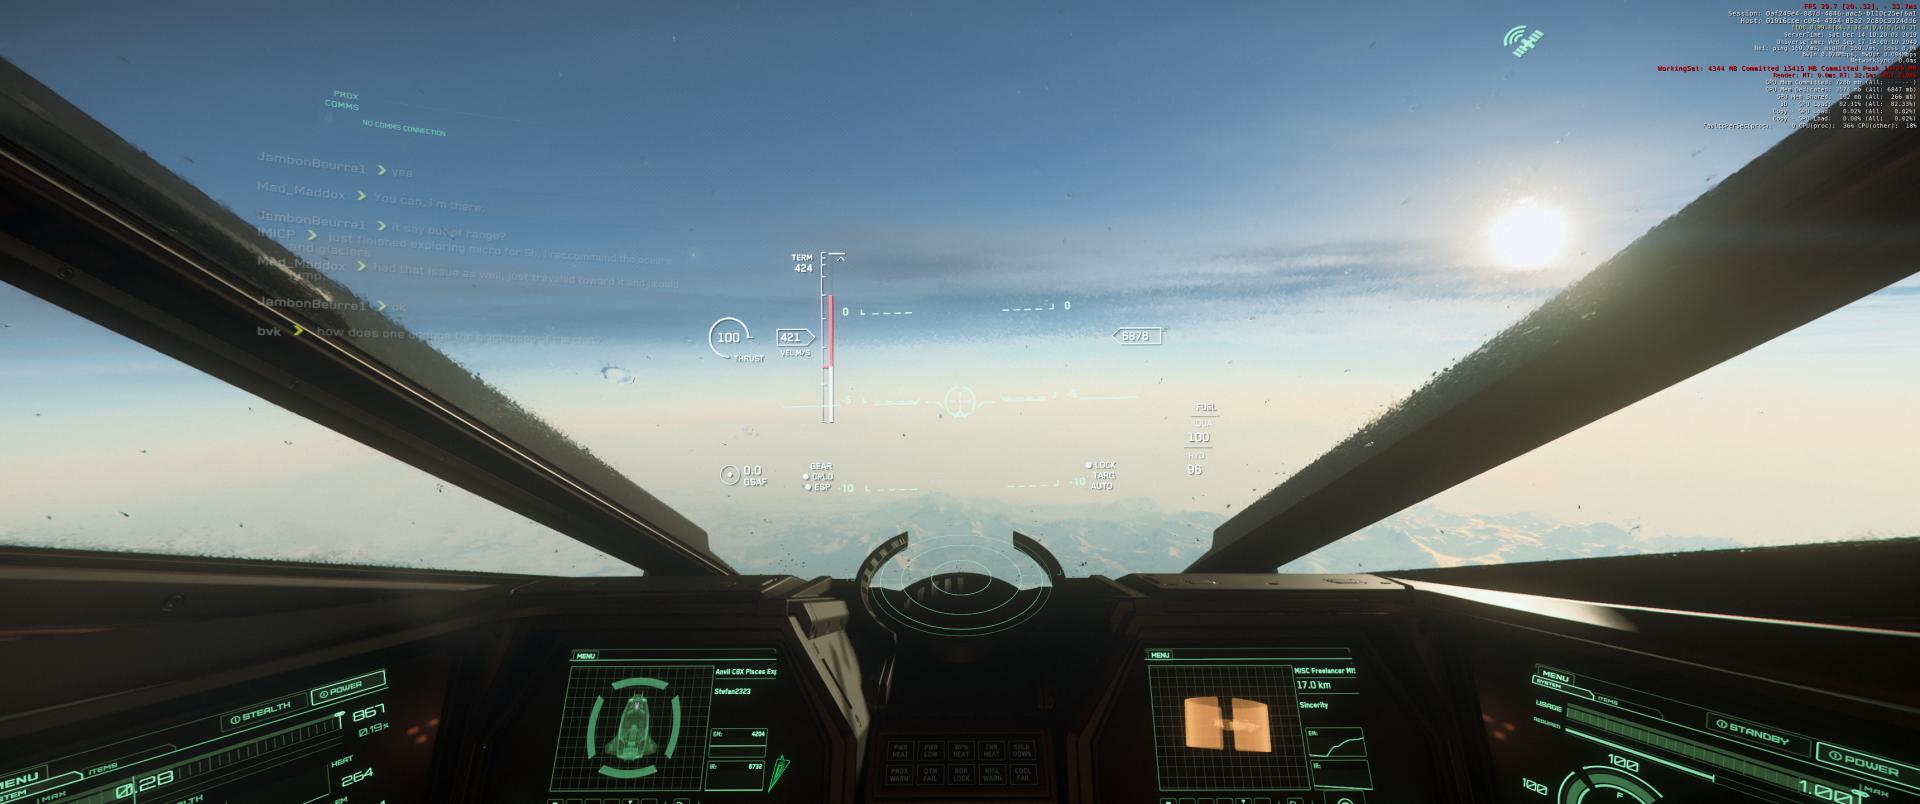 1822388470_Squadron42-StarCitizenScreenshot2019_12.14-11_19_02_81.thumb.png.8334a68d1fc0314828381b1f62116911.png